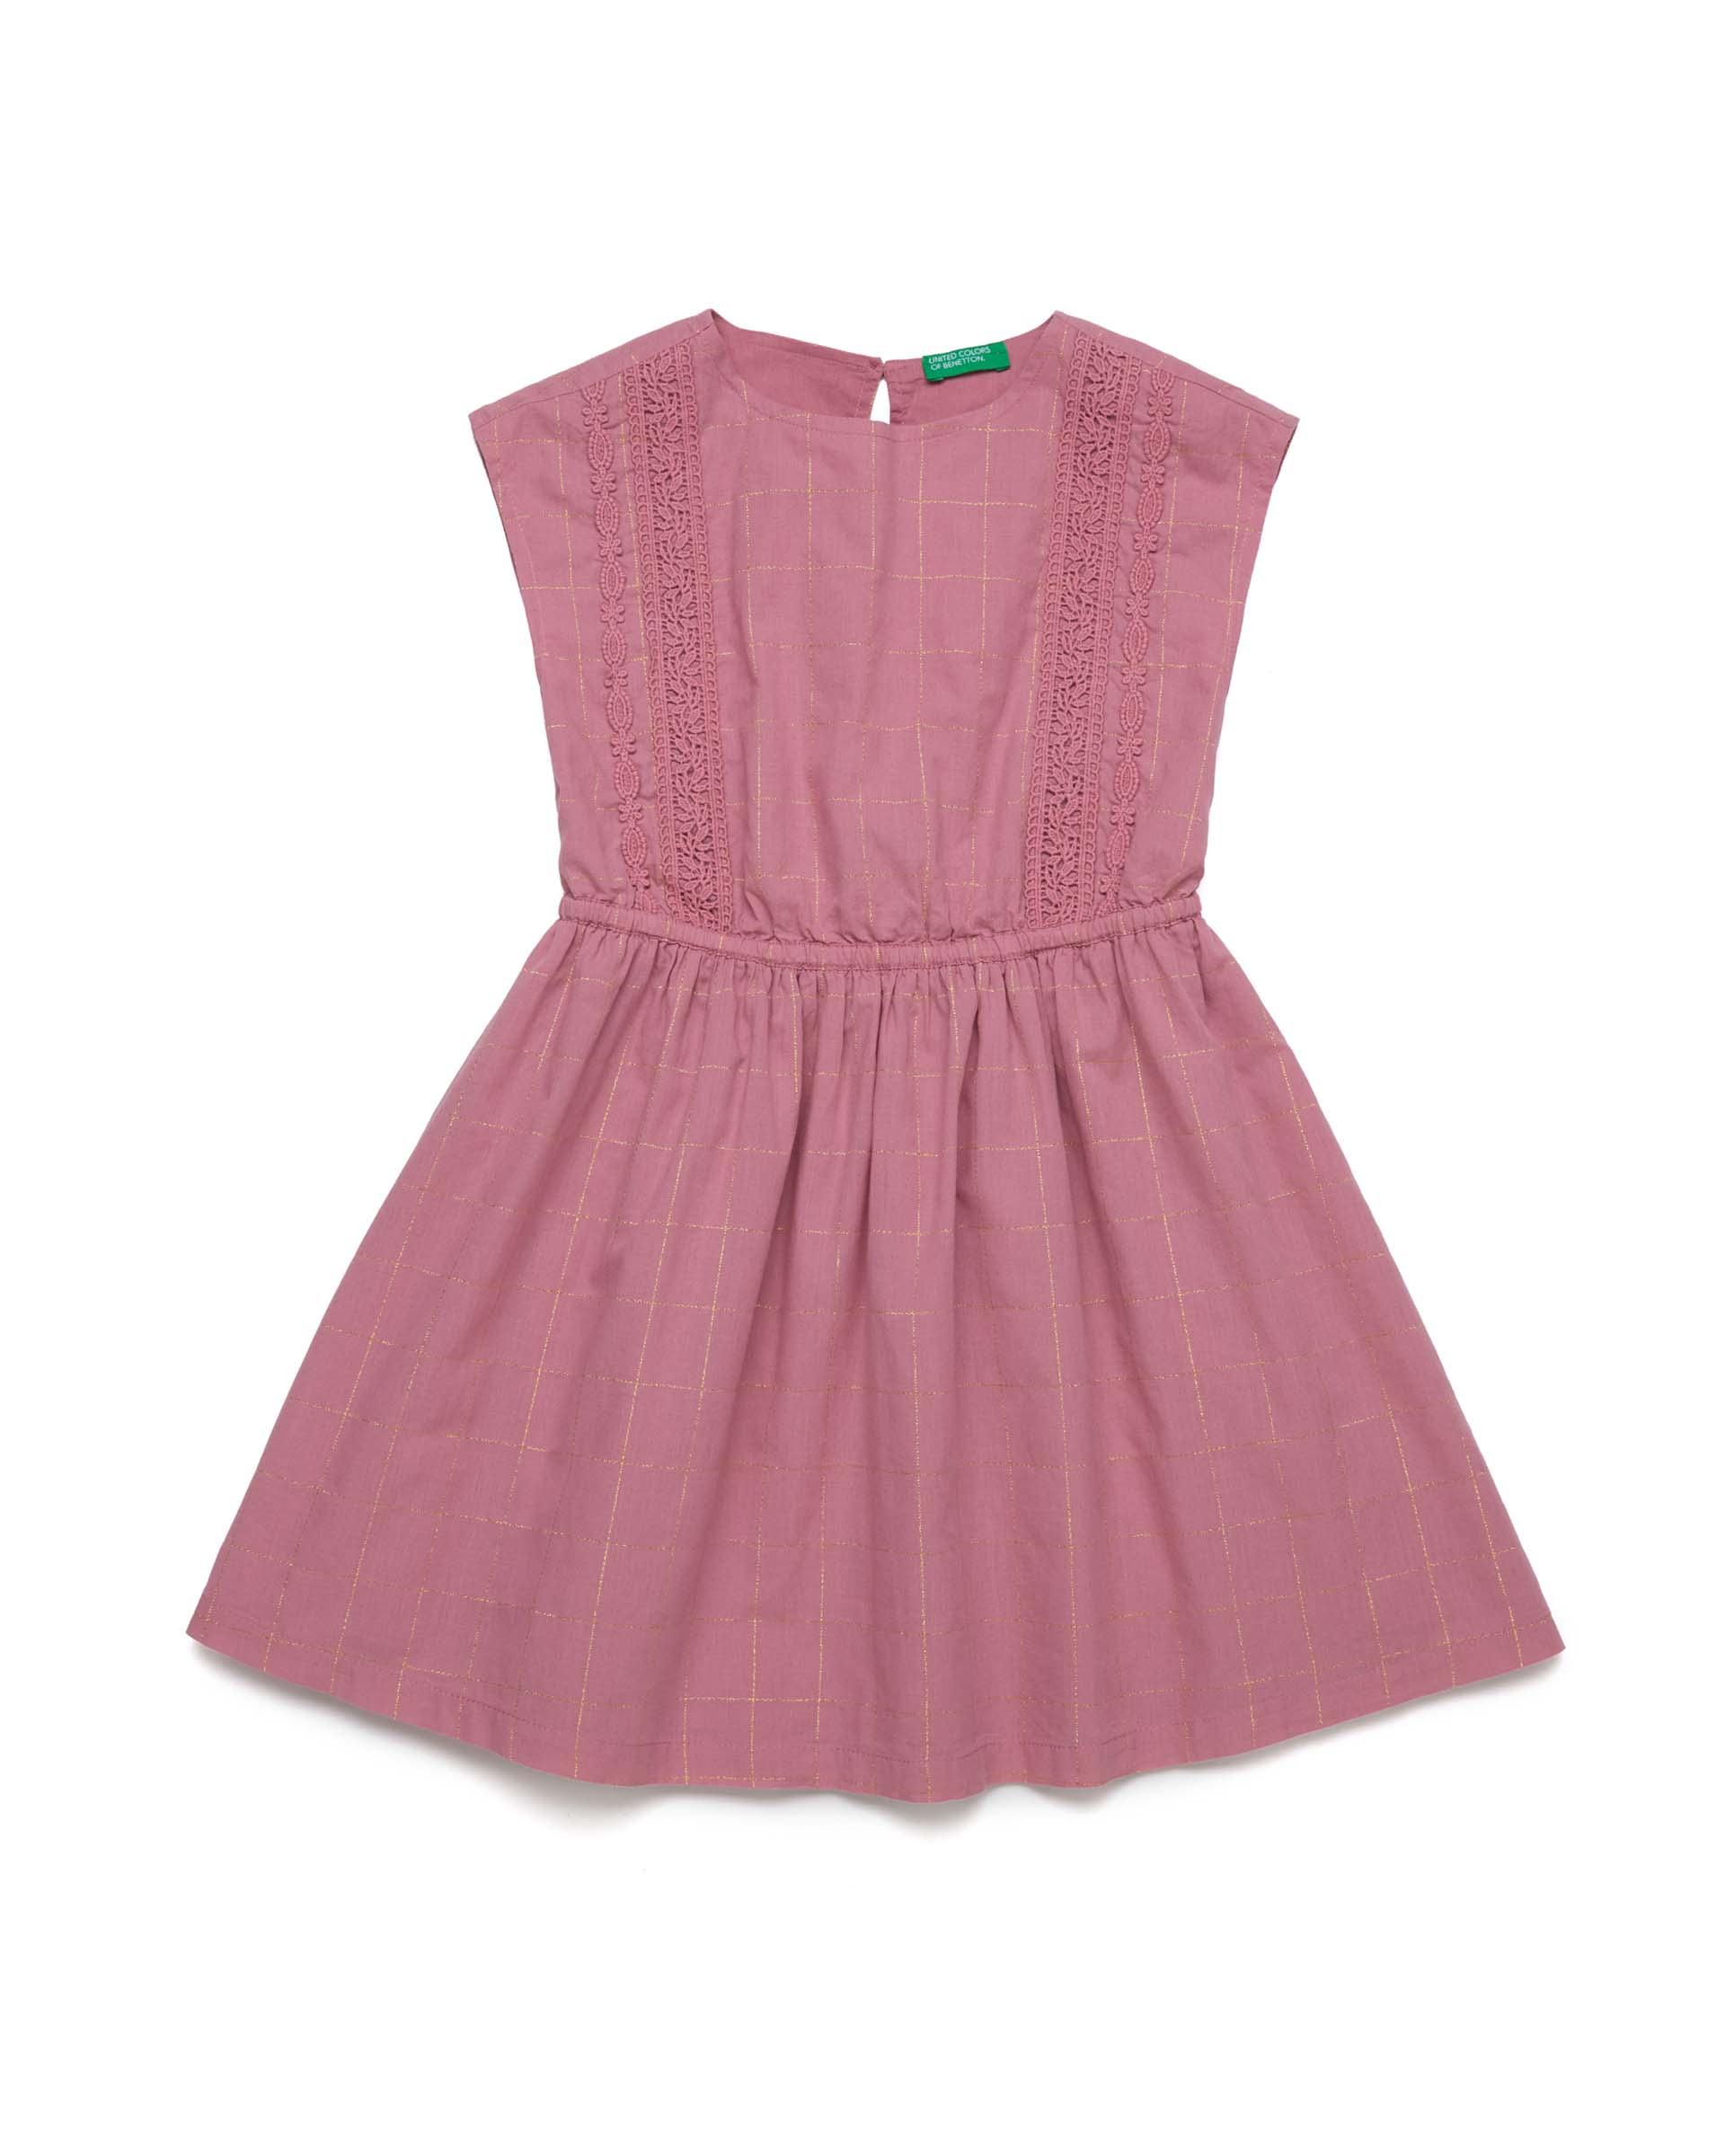 20P_4OV55VDH0_910, Платье для девочек Benetton 4OV55VDH0_910 р-р 158, United Colors of Benetton, Платья для девочек  - купить со скидкой